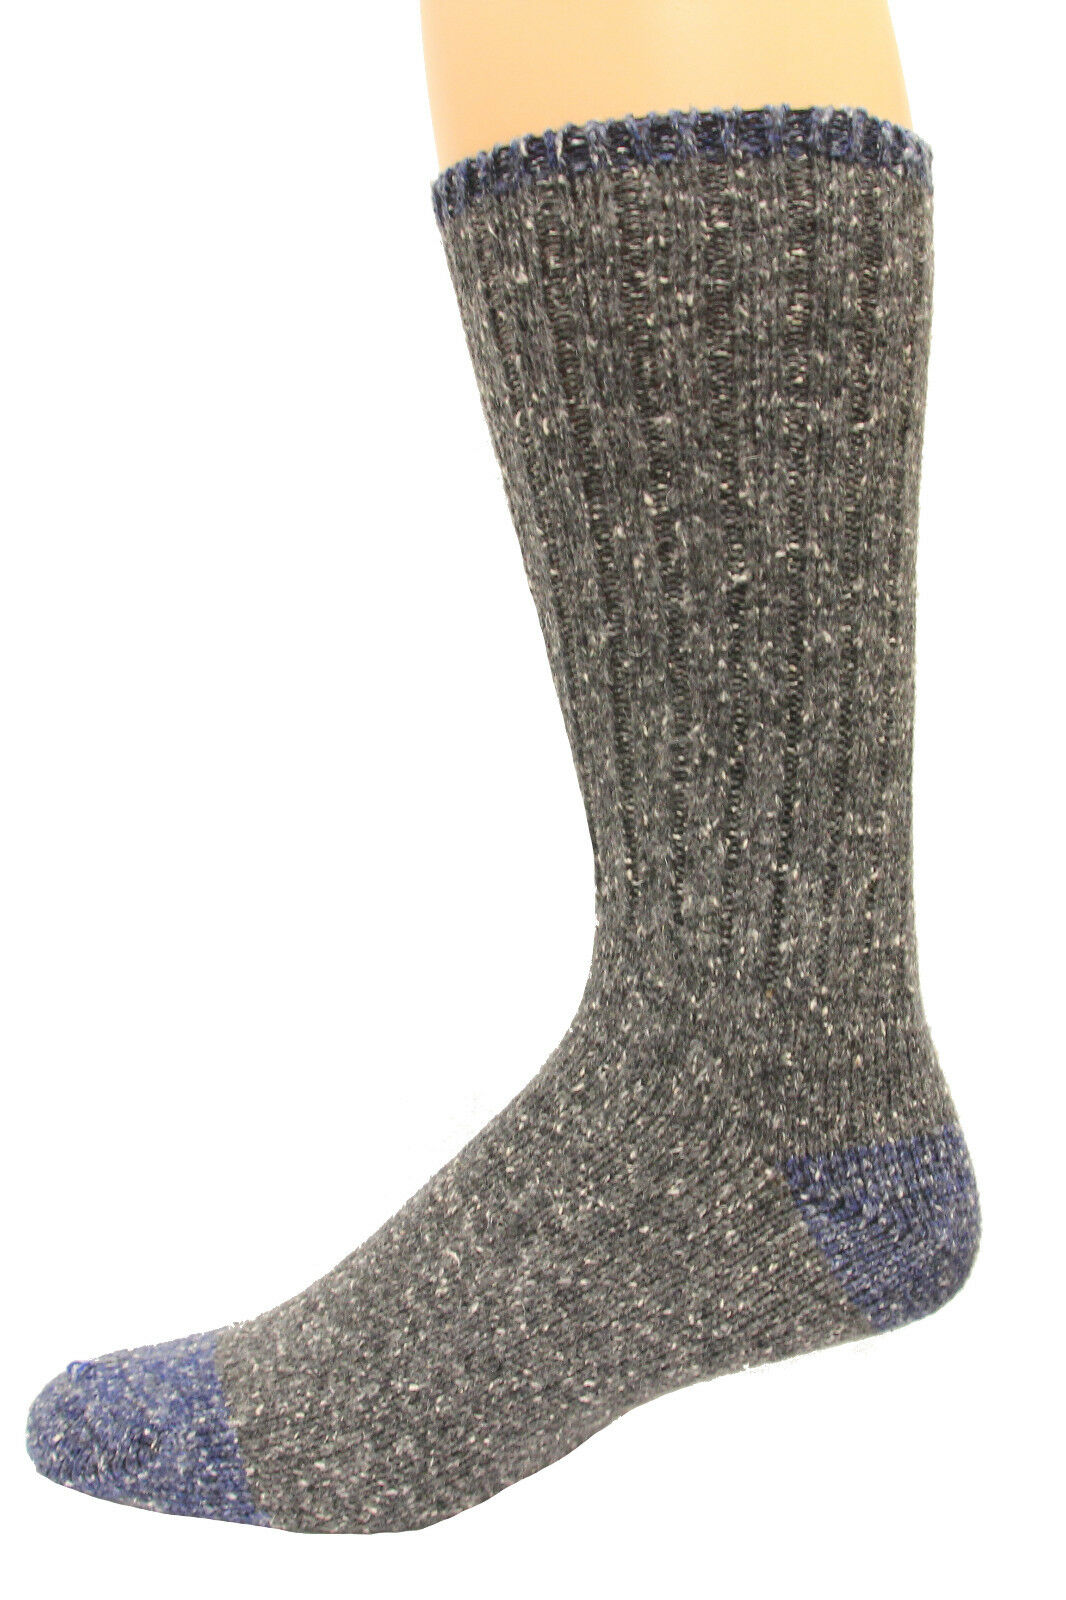 Wise Blend Men's Marl Boot Socks, 1 Pair, Medium, Shoe Size M 9-13 (264)